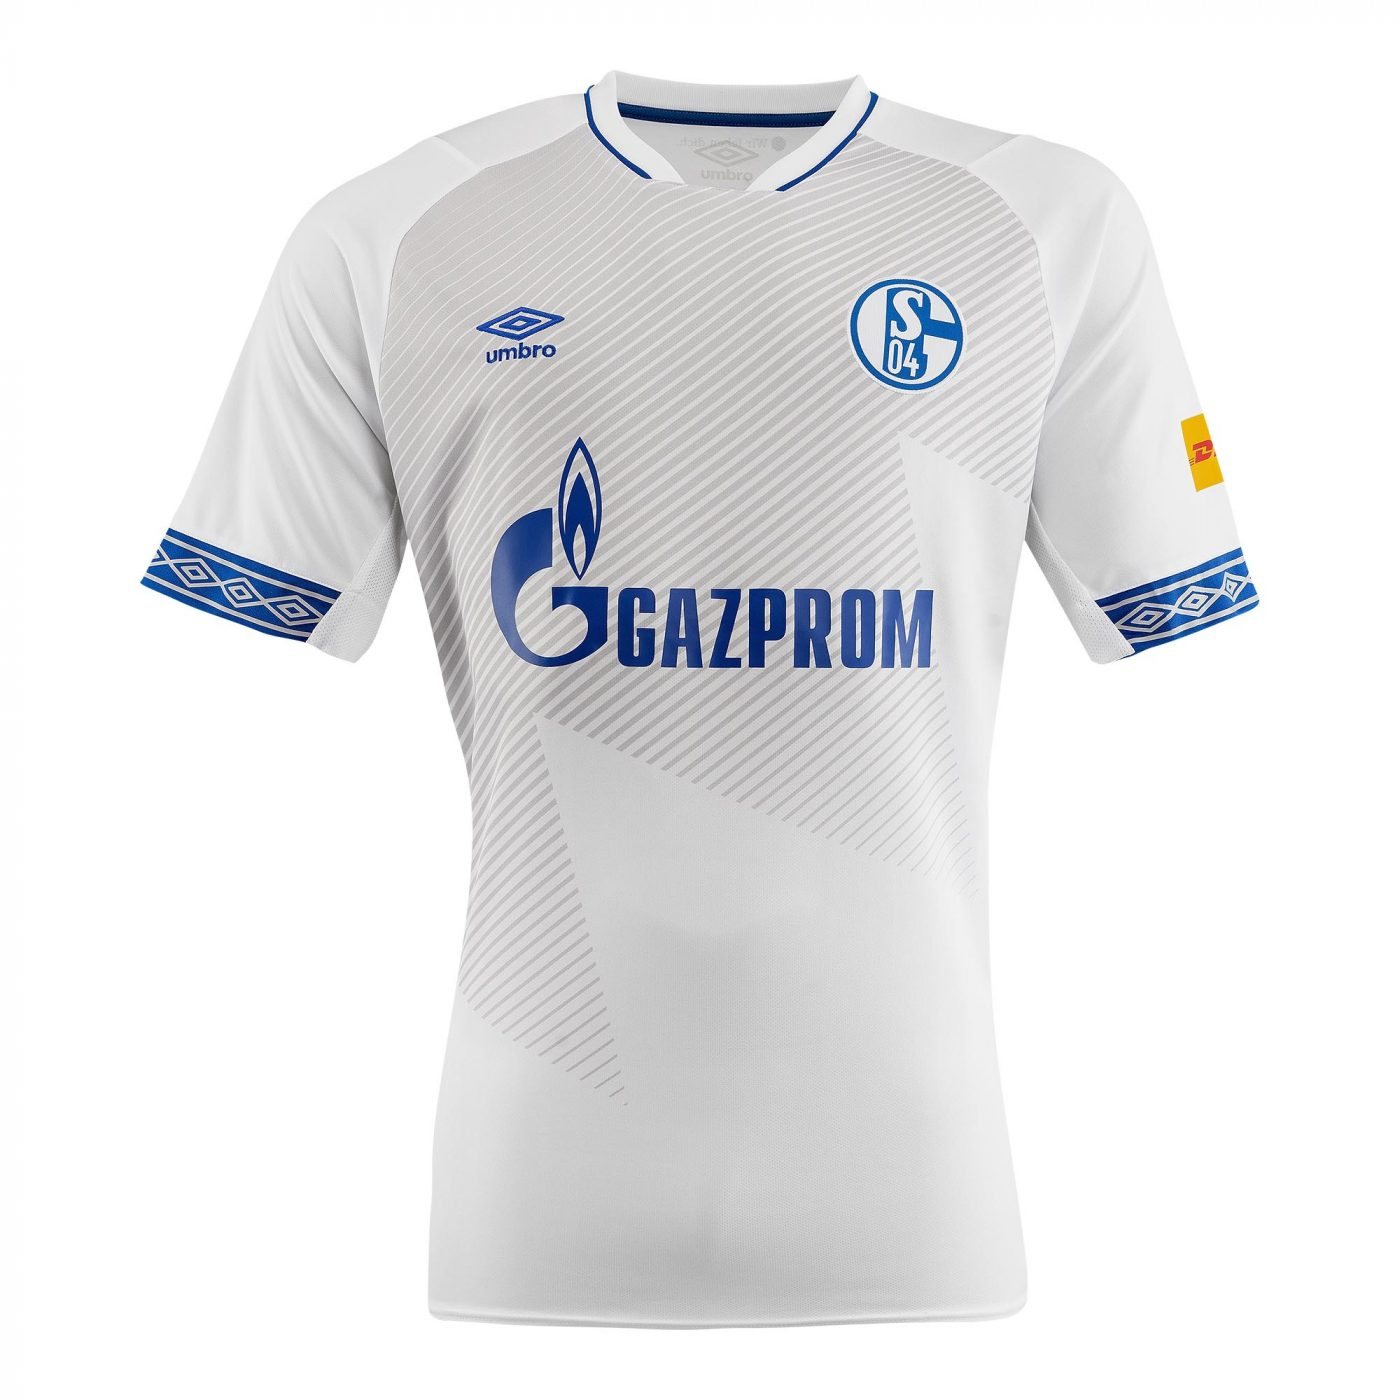 echange-maillot-schalke-04-fc-nuremberg-clubs-amis-bundesliga-umbro